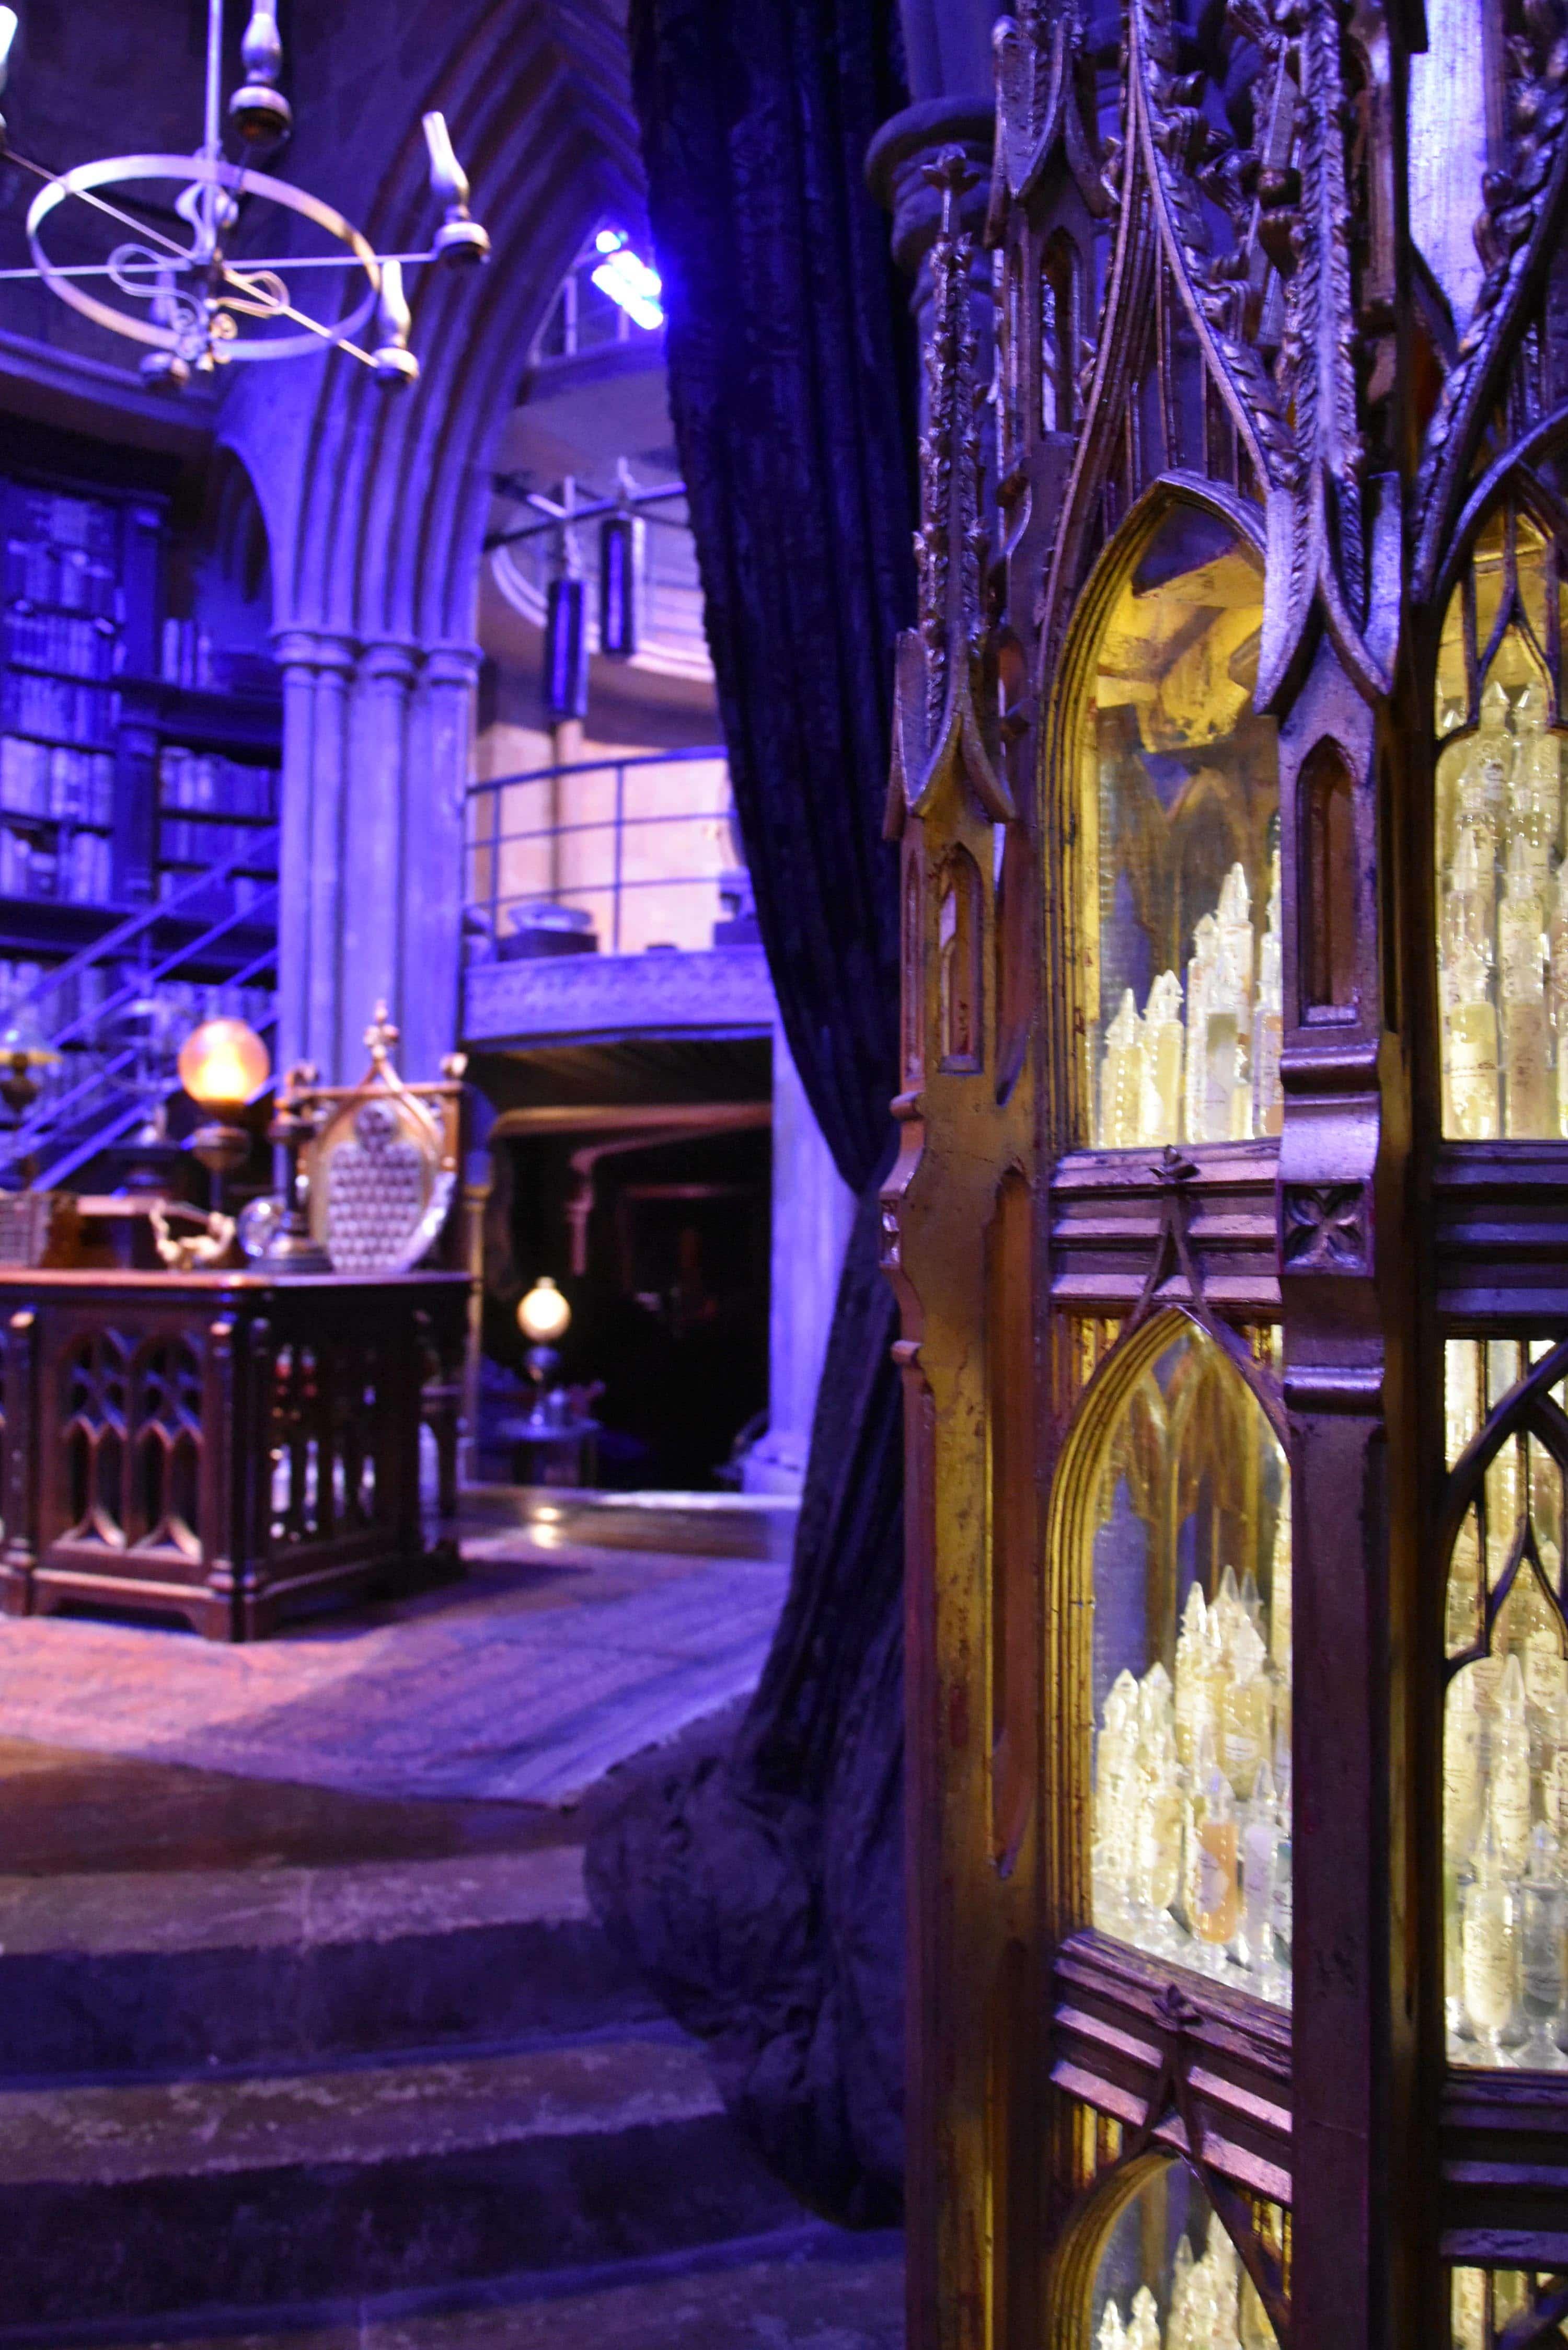 making of harry potter – studio tour london